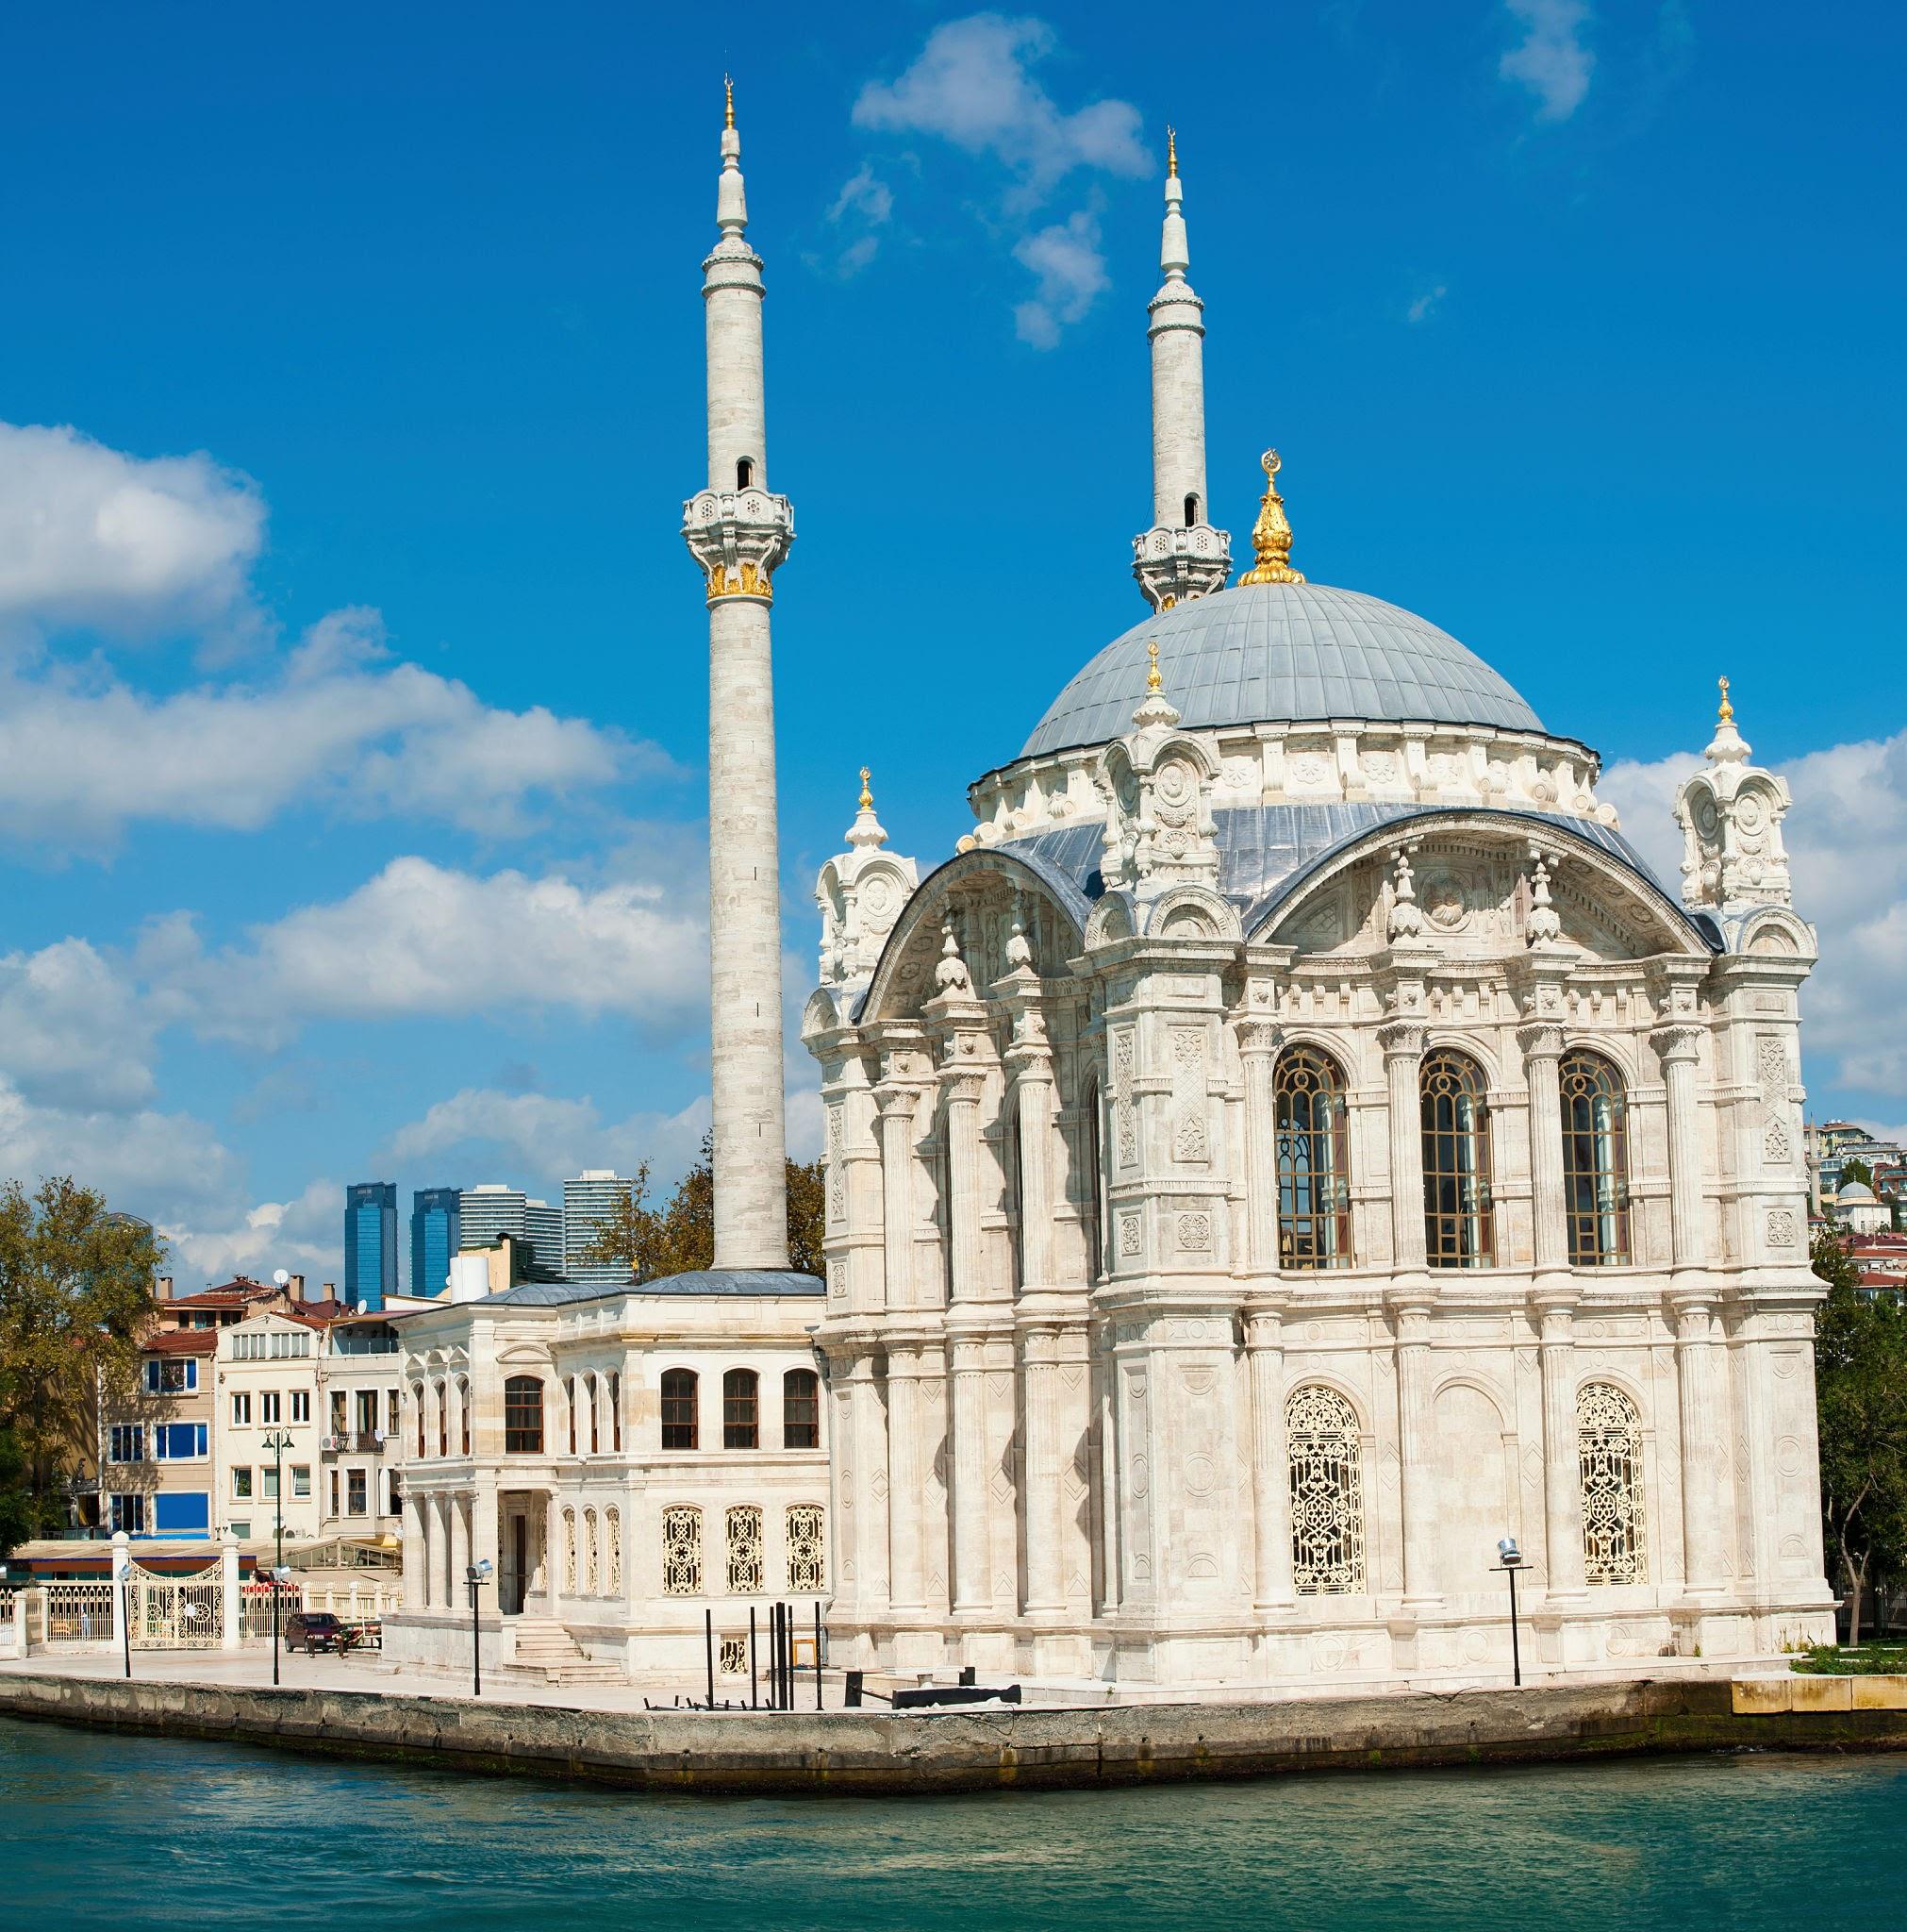 Büyük Mecidiye Mosque (Ortaköy Mosque)